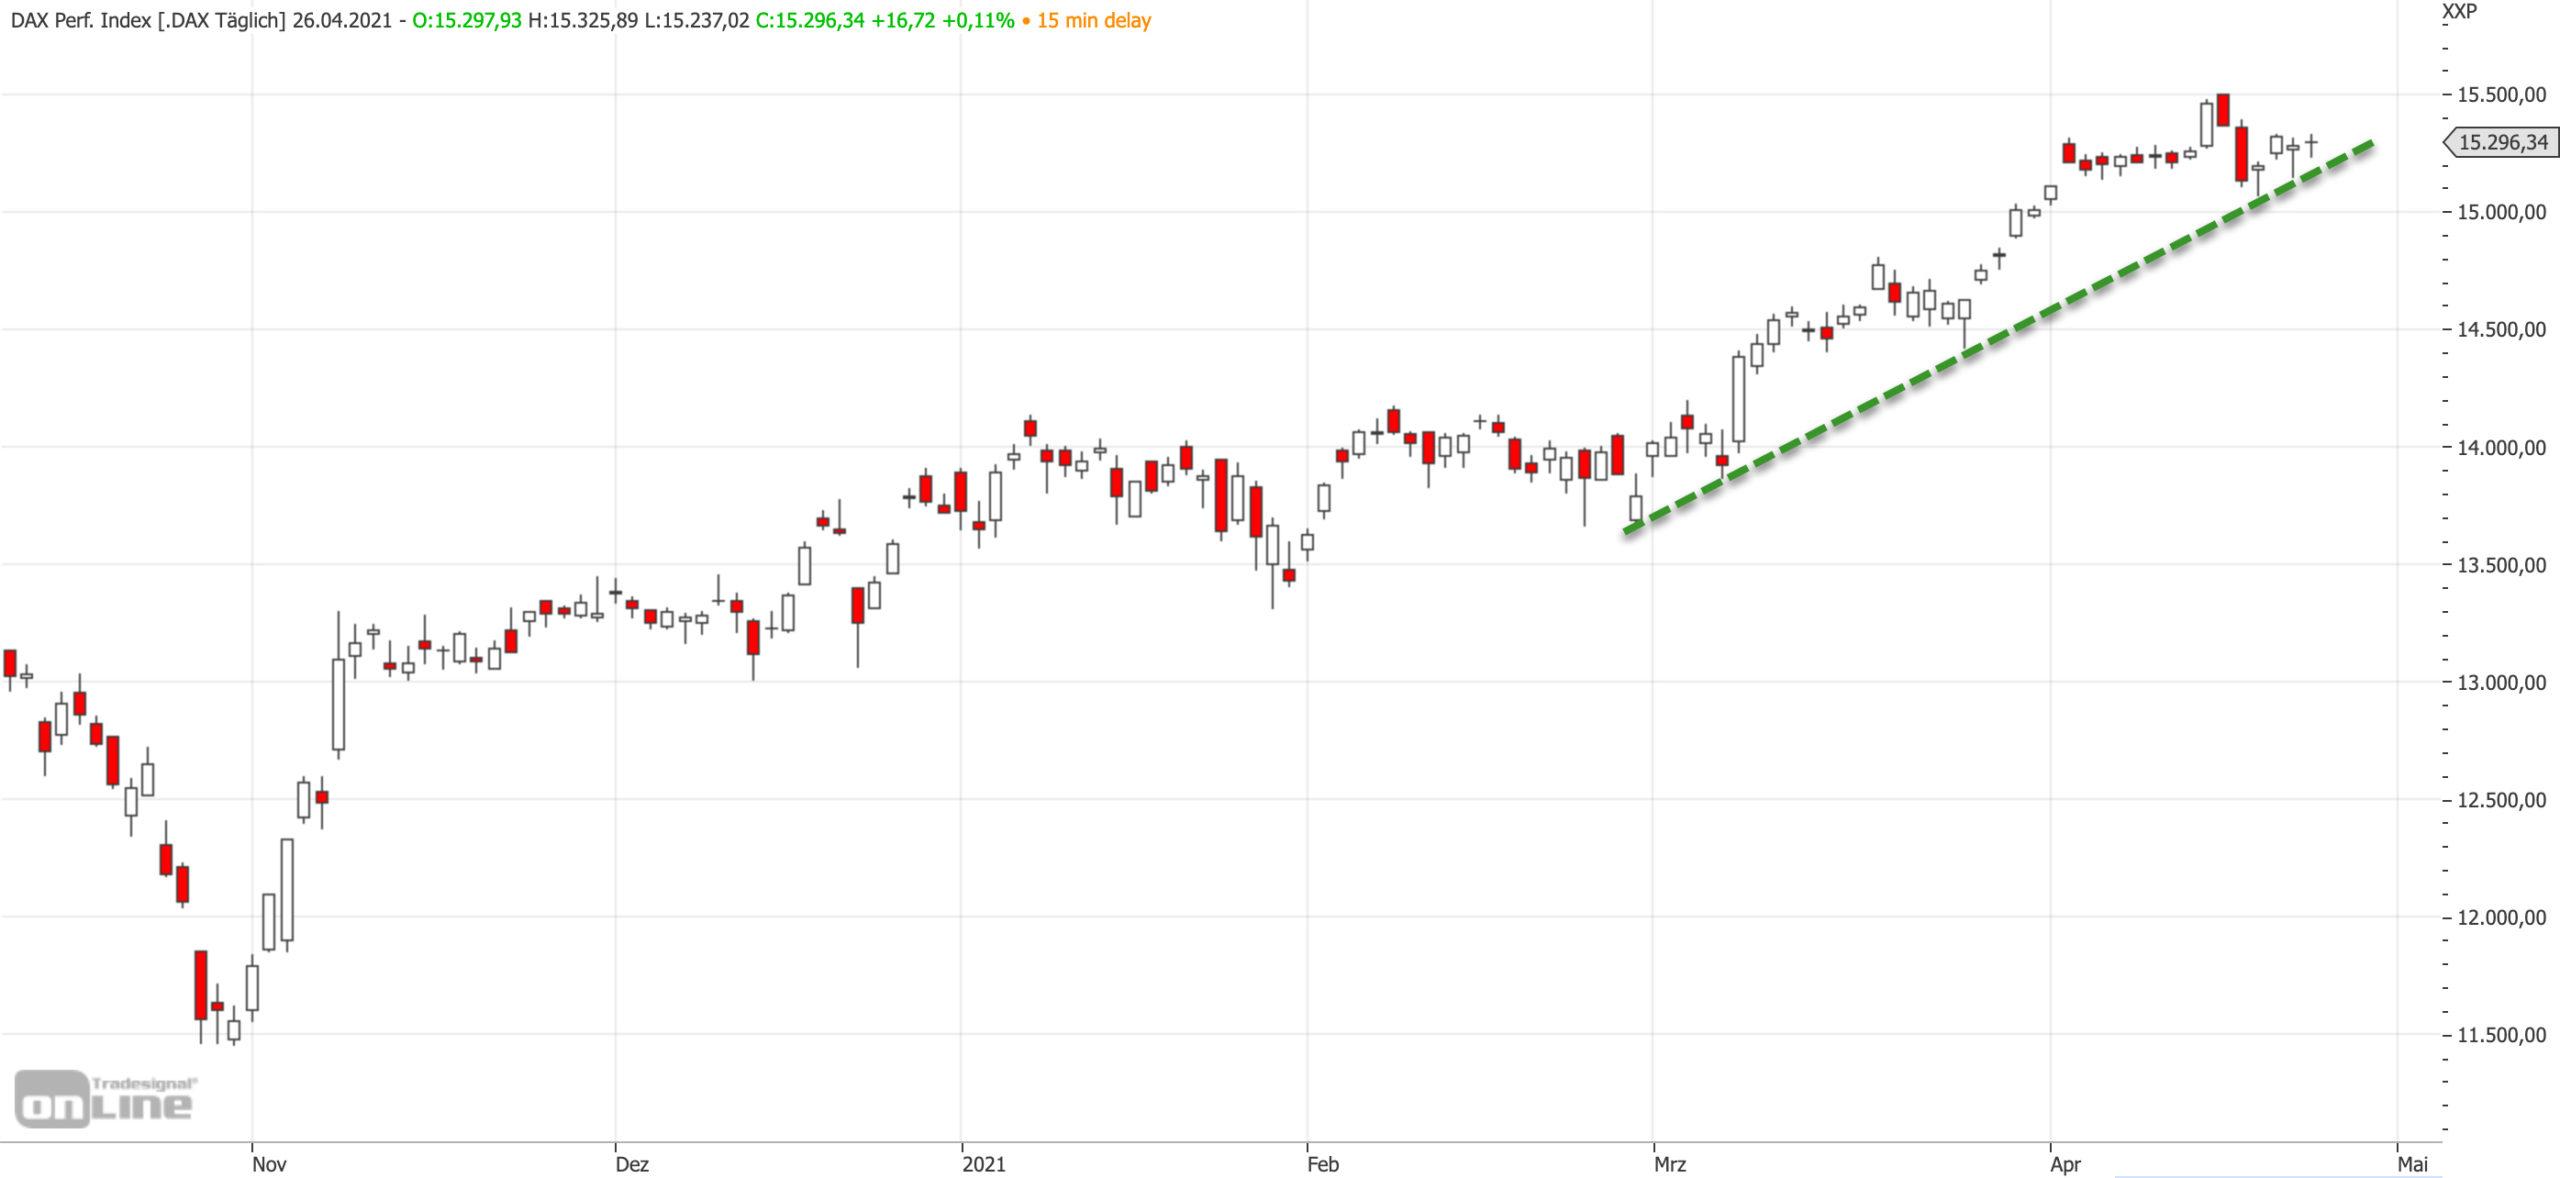 Mittelfristiger DAX-Chart am 26.04.2021